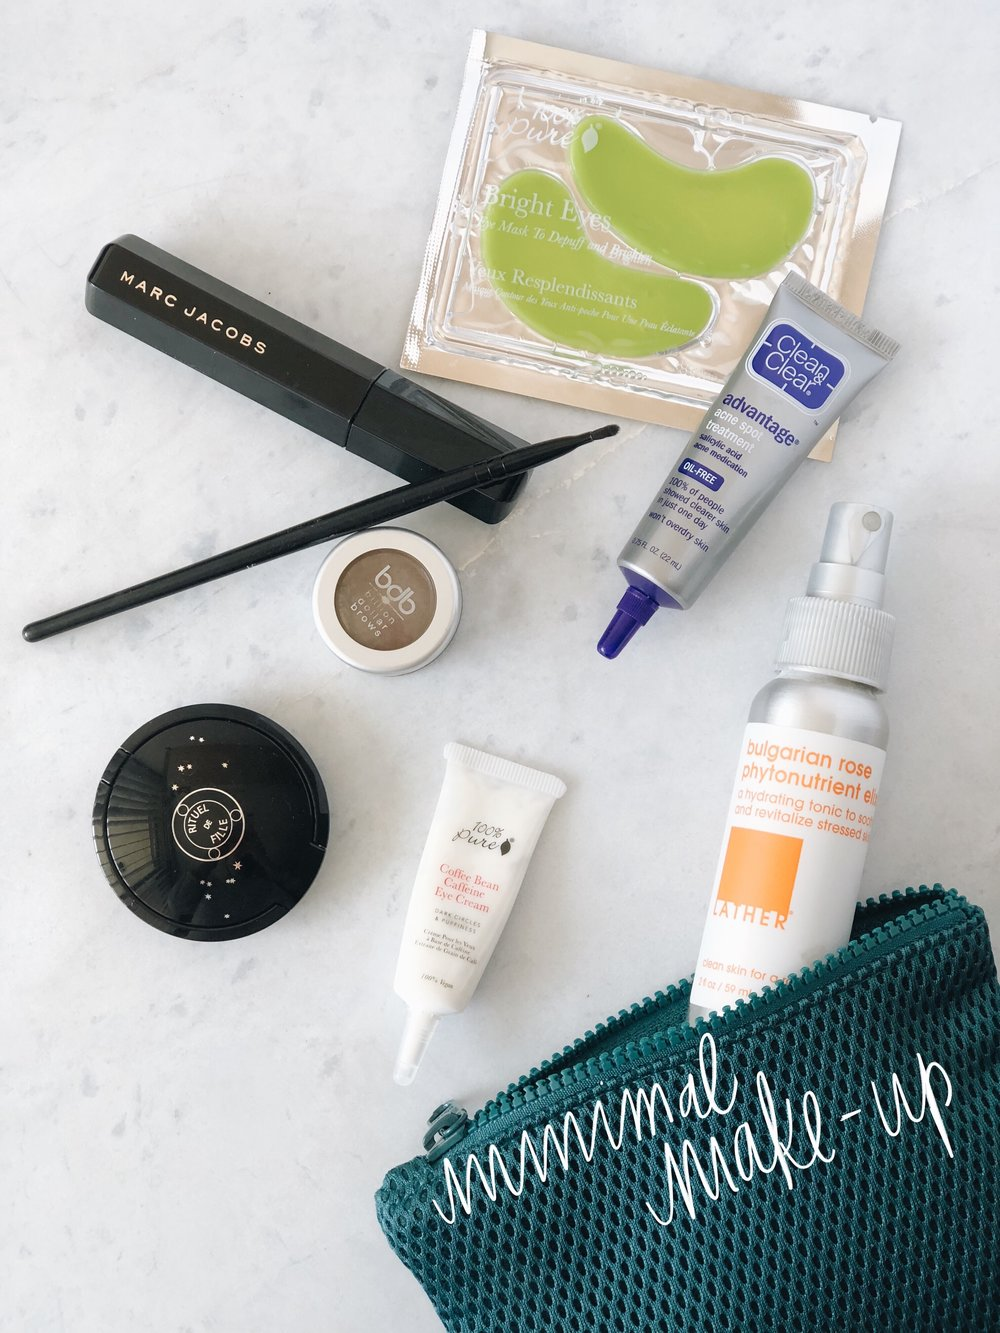 I don't wear a ton of makeup, but here's what I do use!